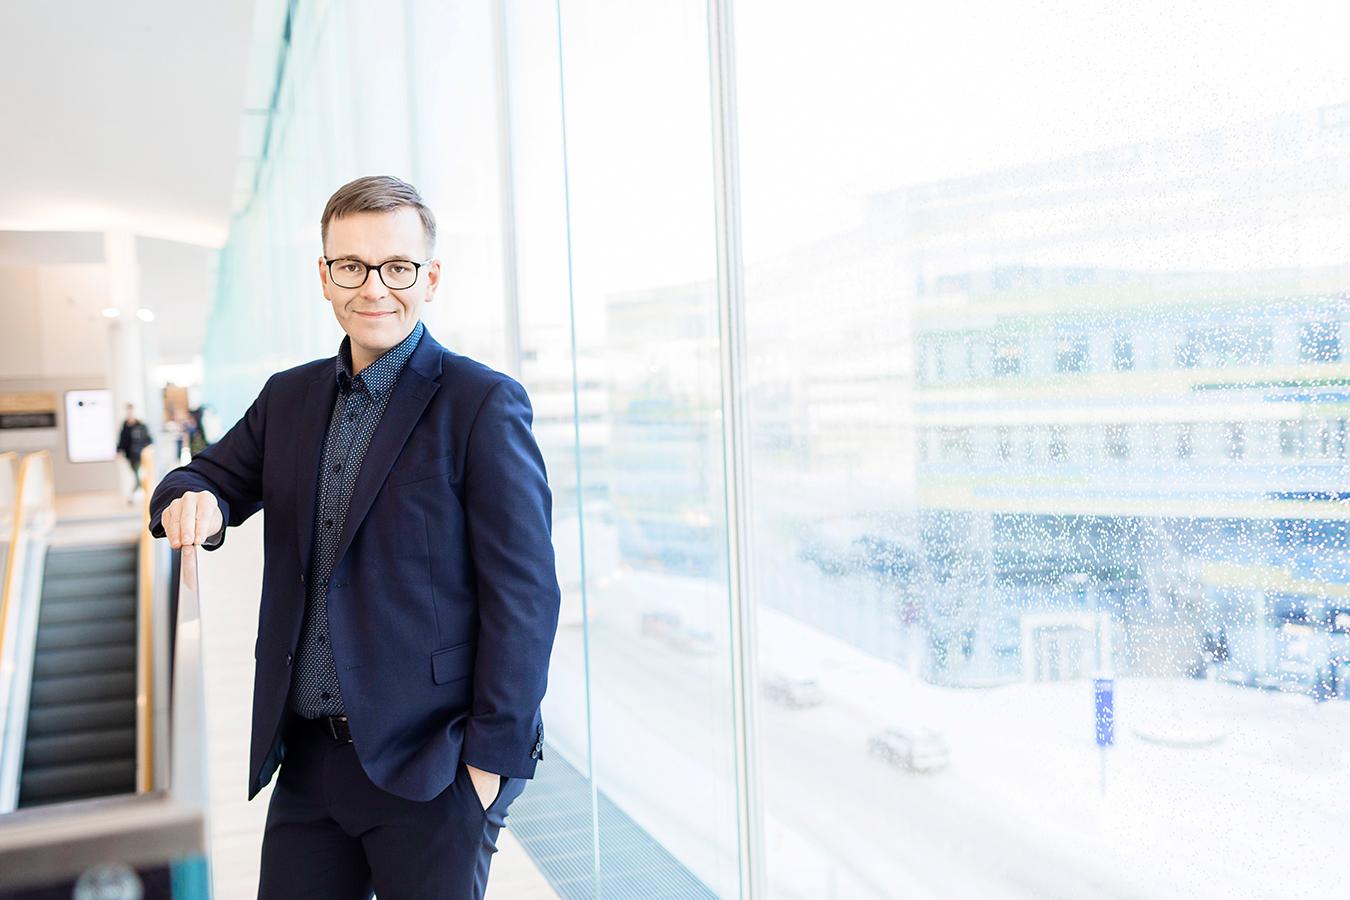 Antti Siika-Aho